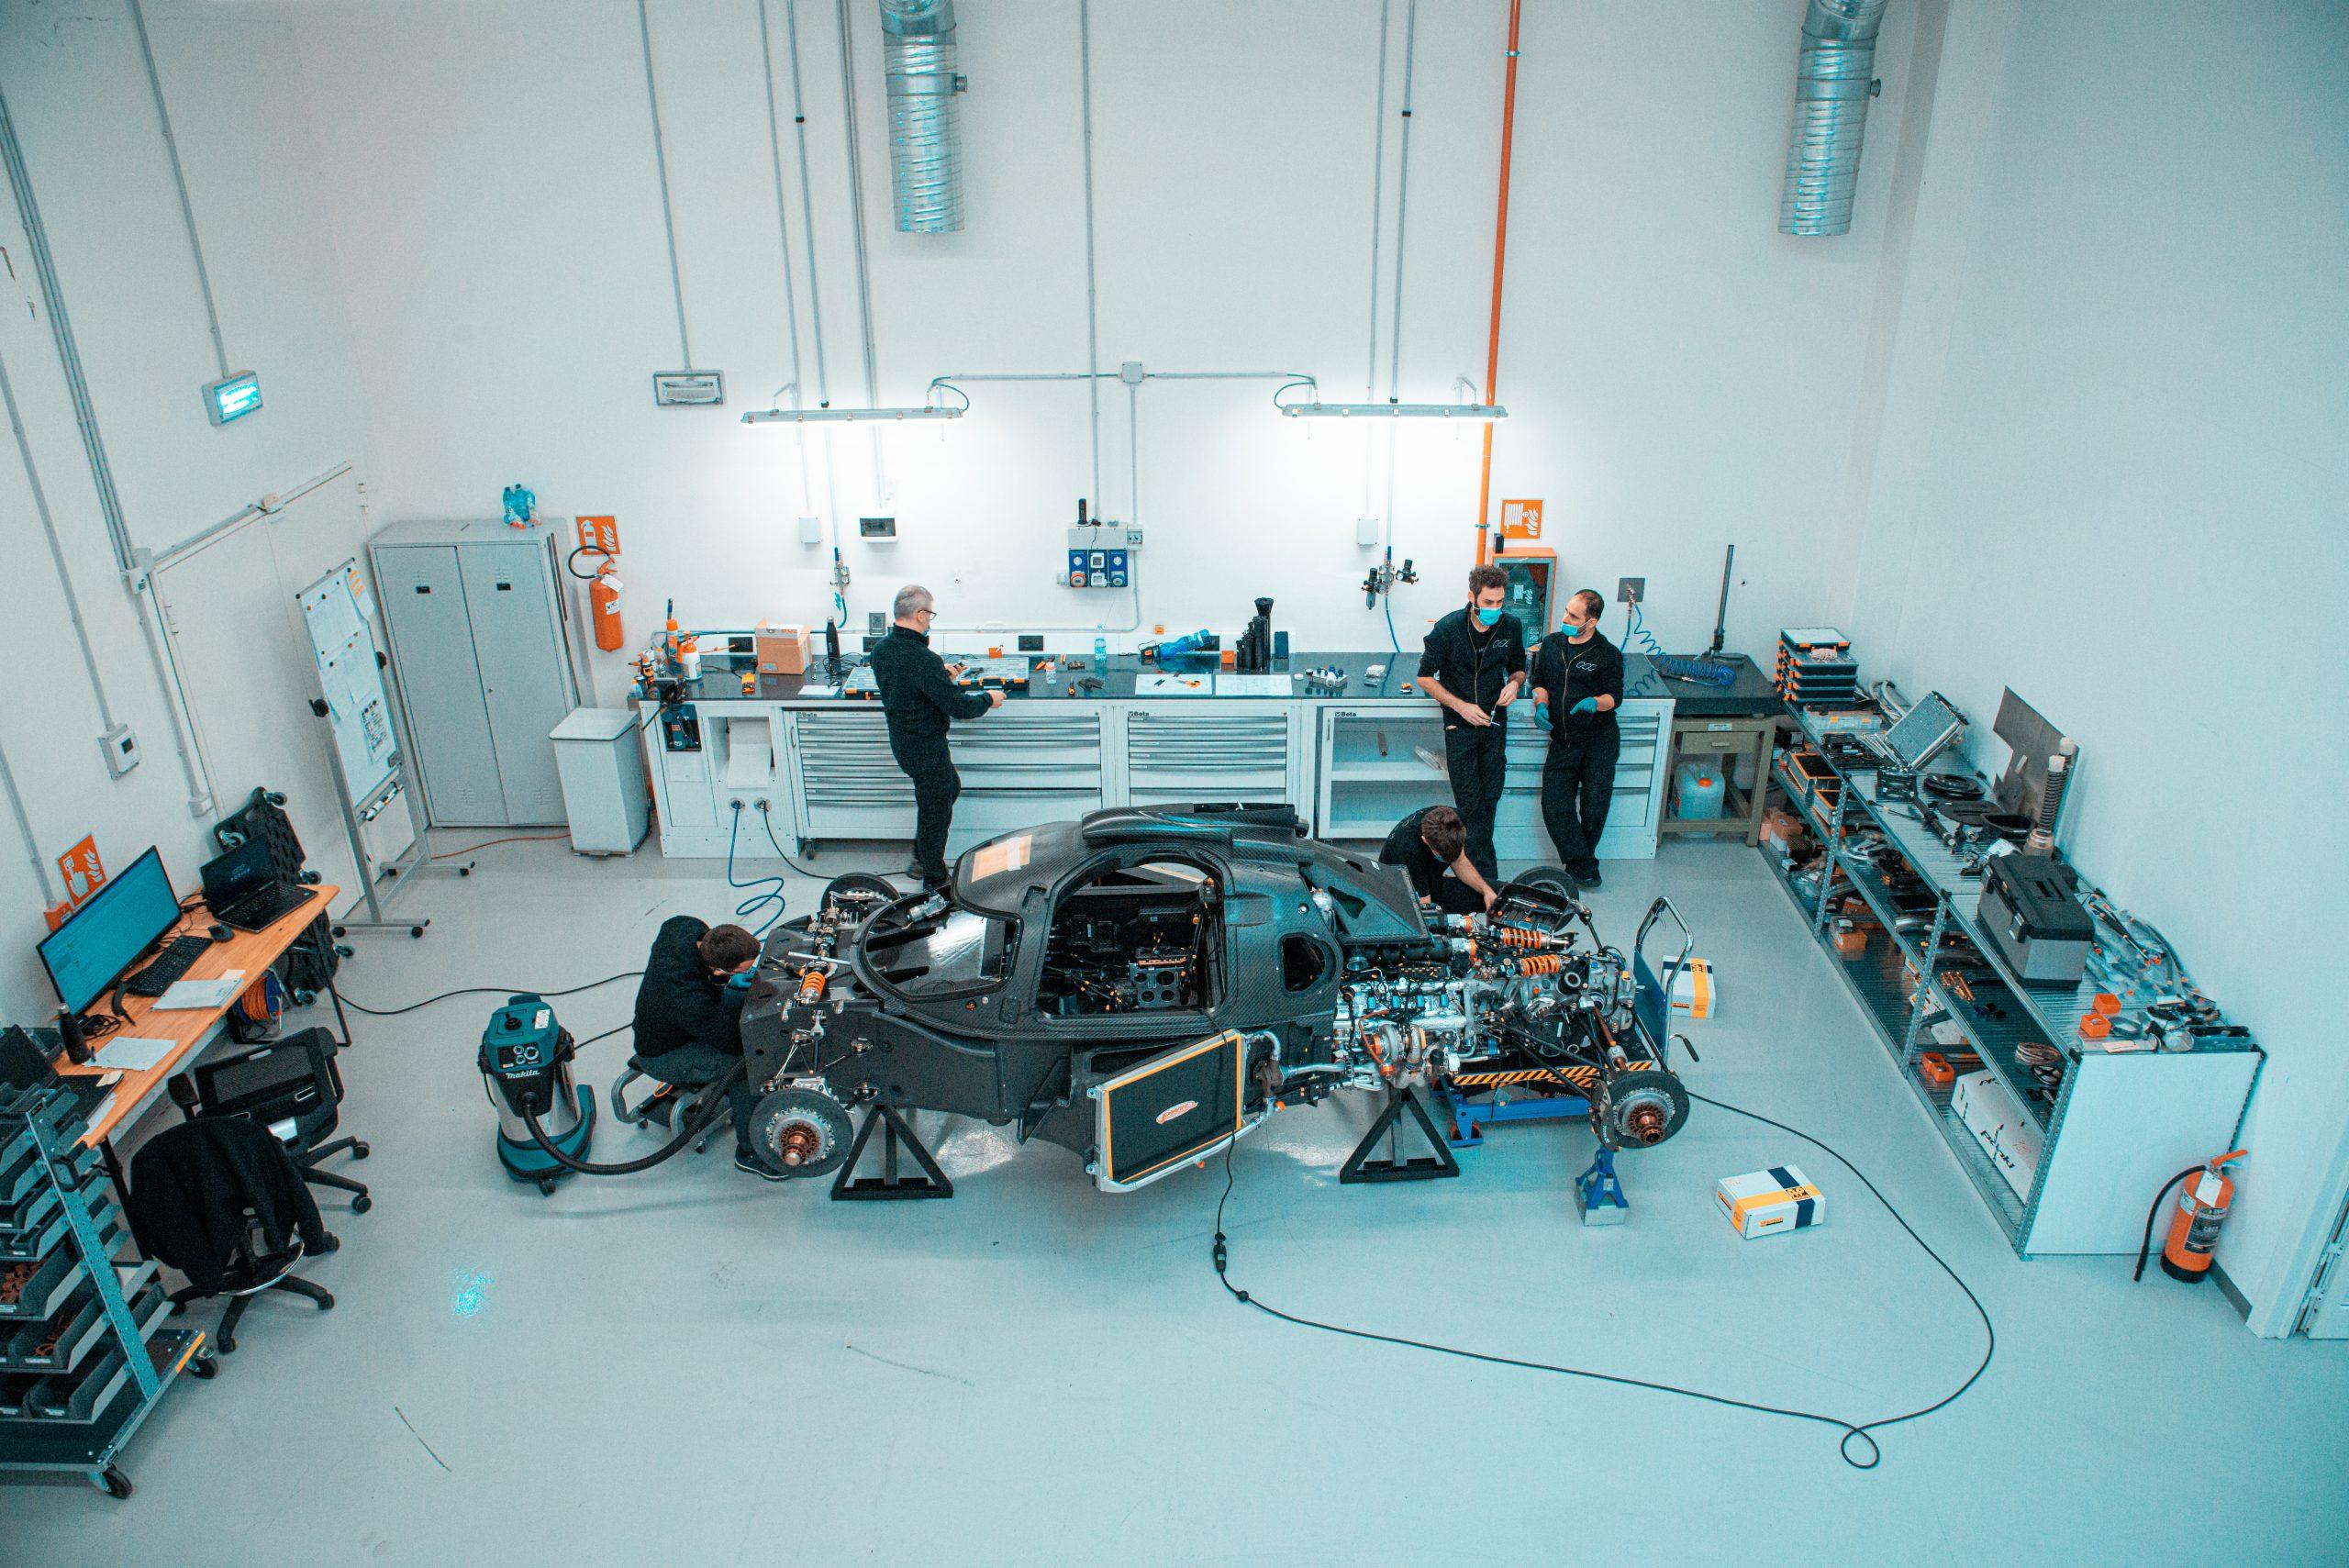 Glickenhaus 007 Hypercar LMH monocoque engine build race shop